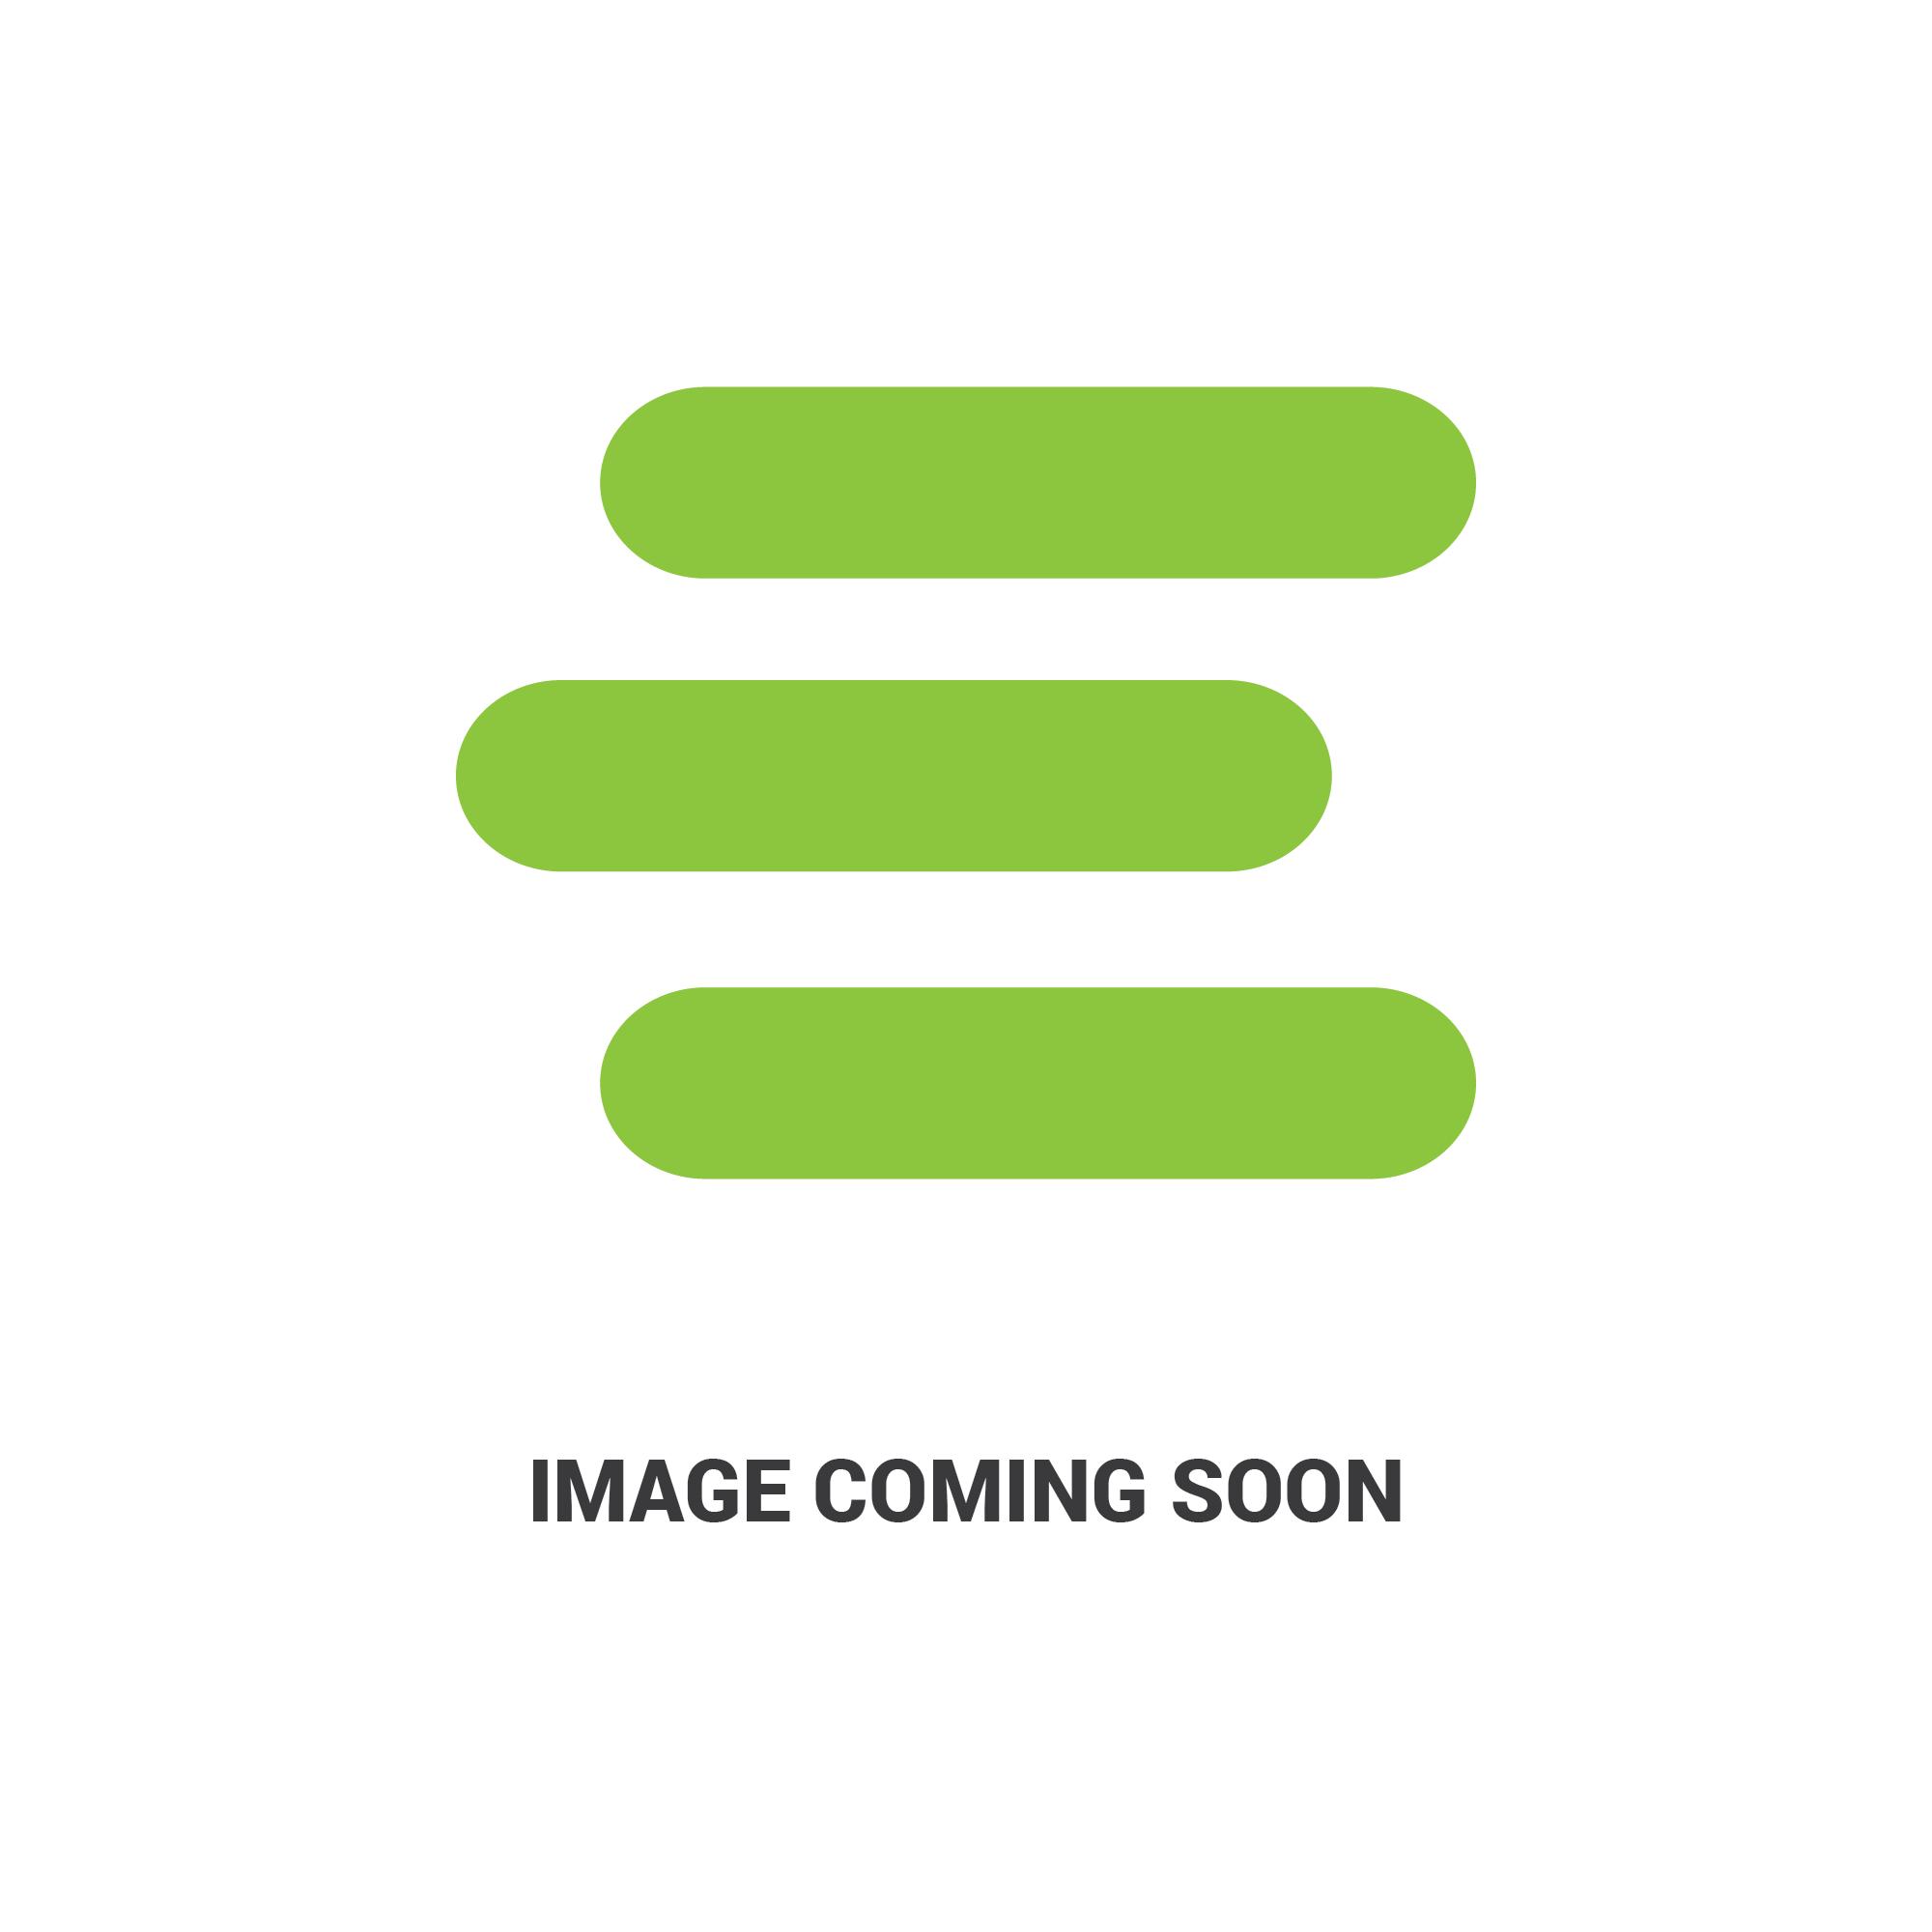 E-53066-0077-3381188_1.jpg